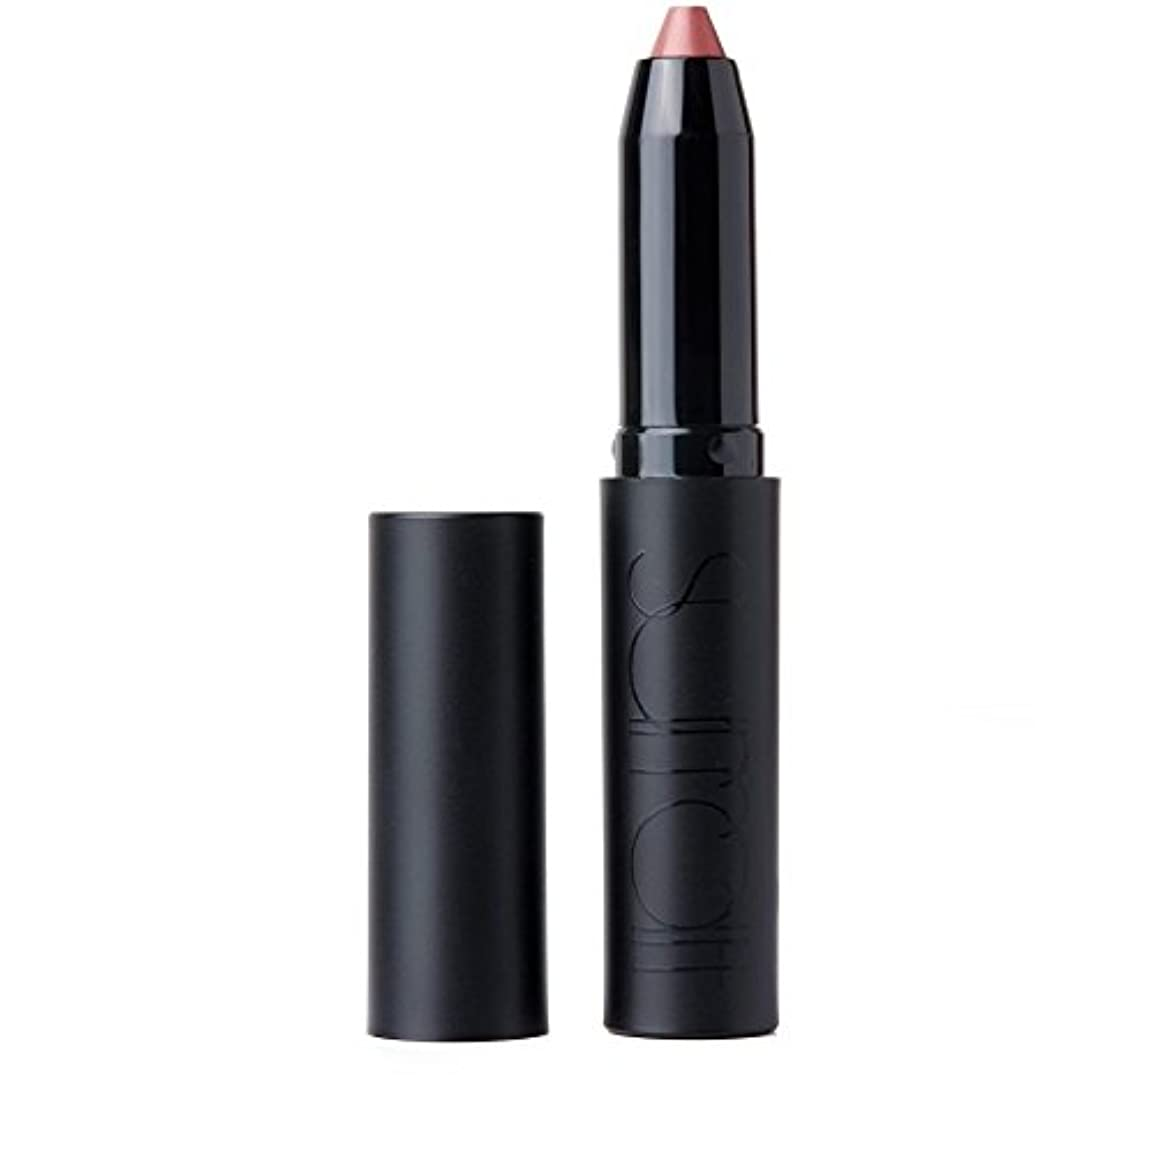 Surratt Lip Crayon 13 Savoir Faire (Pack of 6) - リップクレヨン13サボアの放任 x6 [並行輸入品]